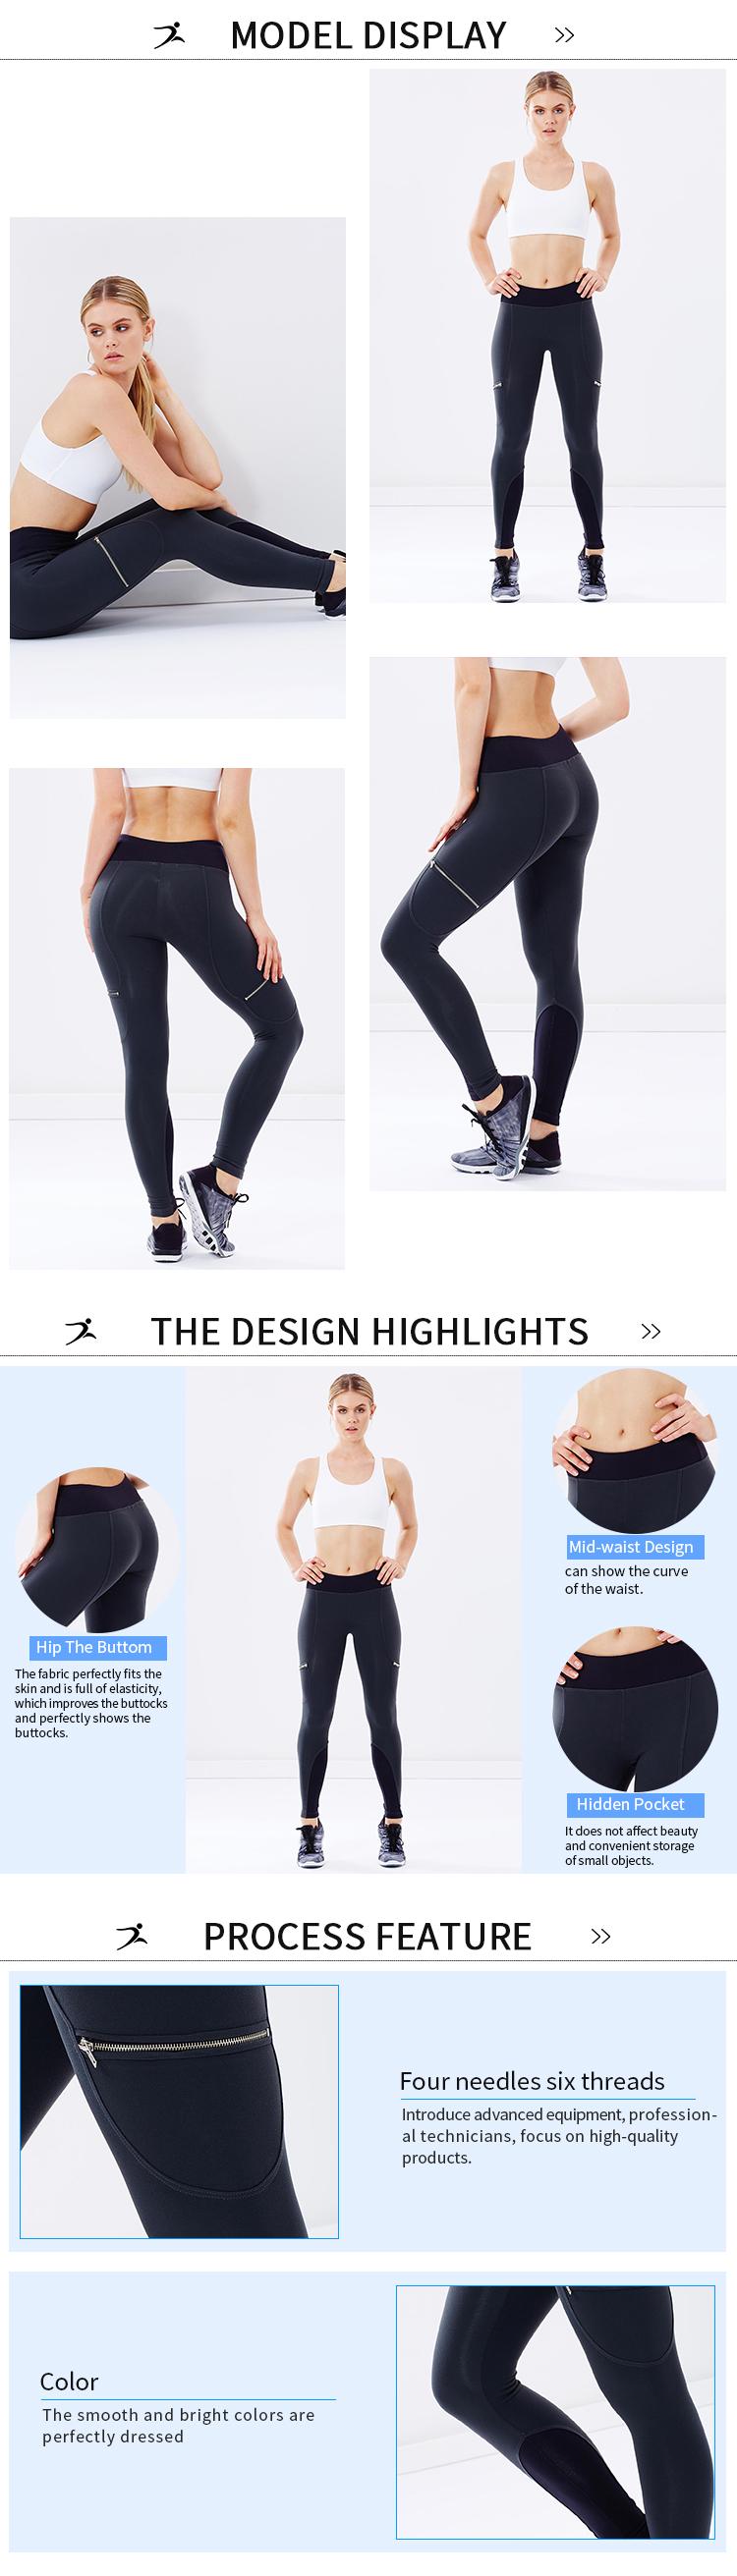 Yoga Pantalons Sport Plein Air vêtements de yoga gym leggings gros